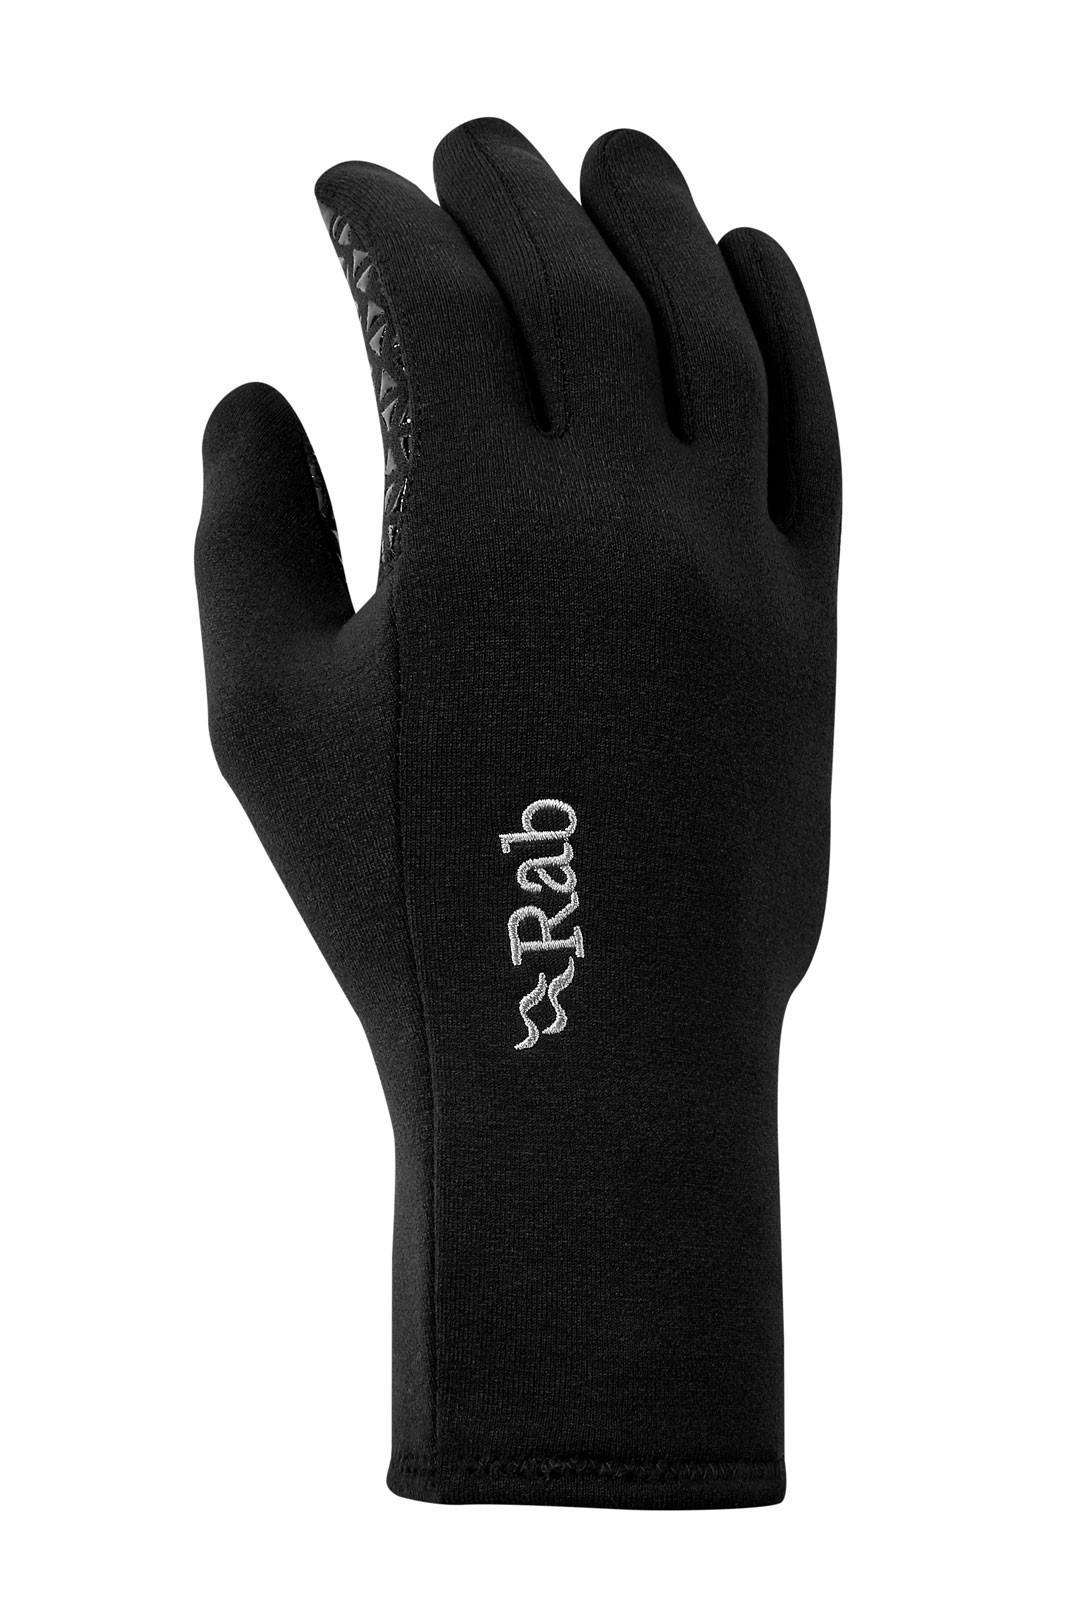 Medium Deep Ink Rab Mens Power Stretch Contact Grip Glove